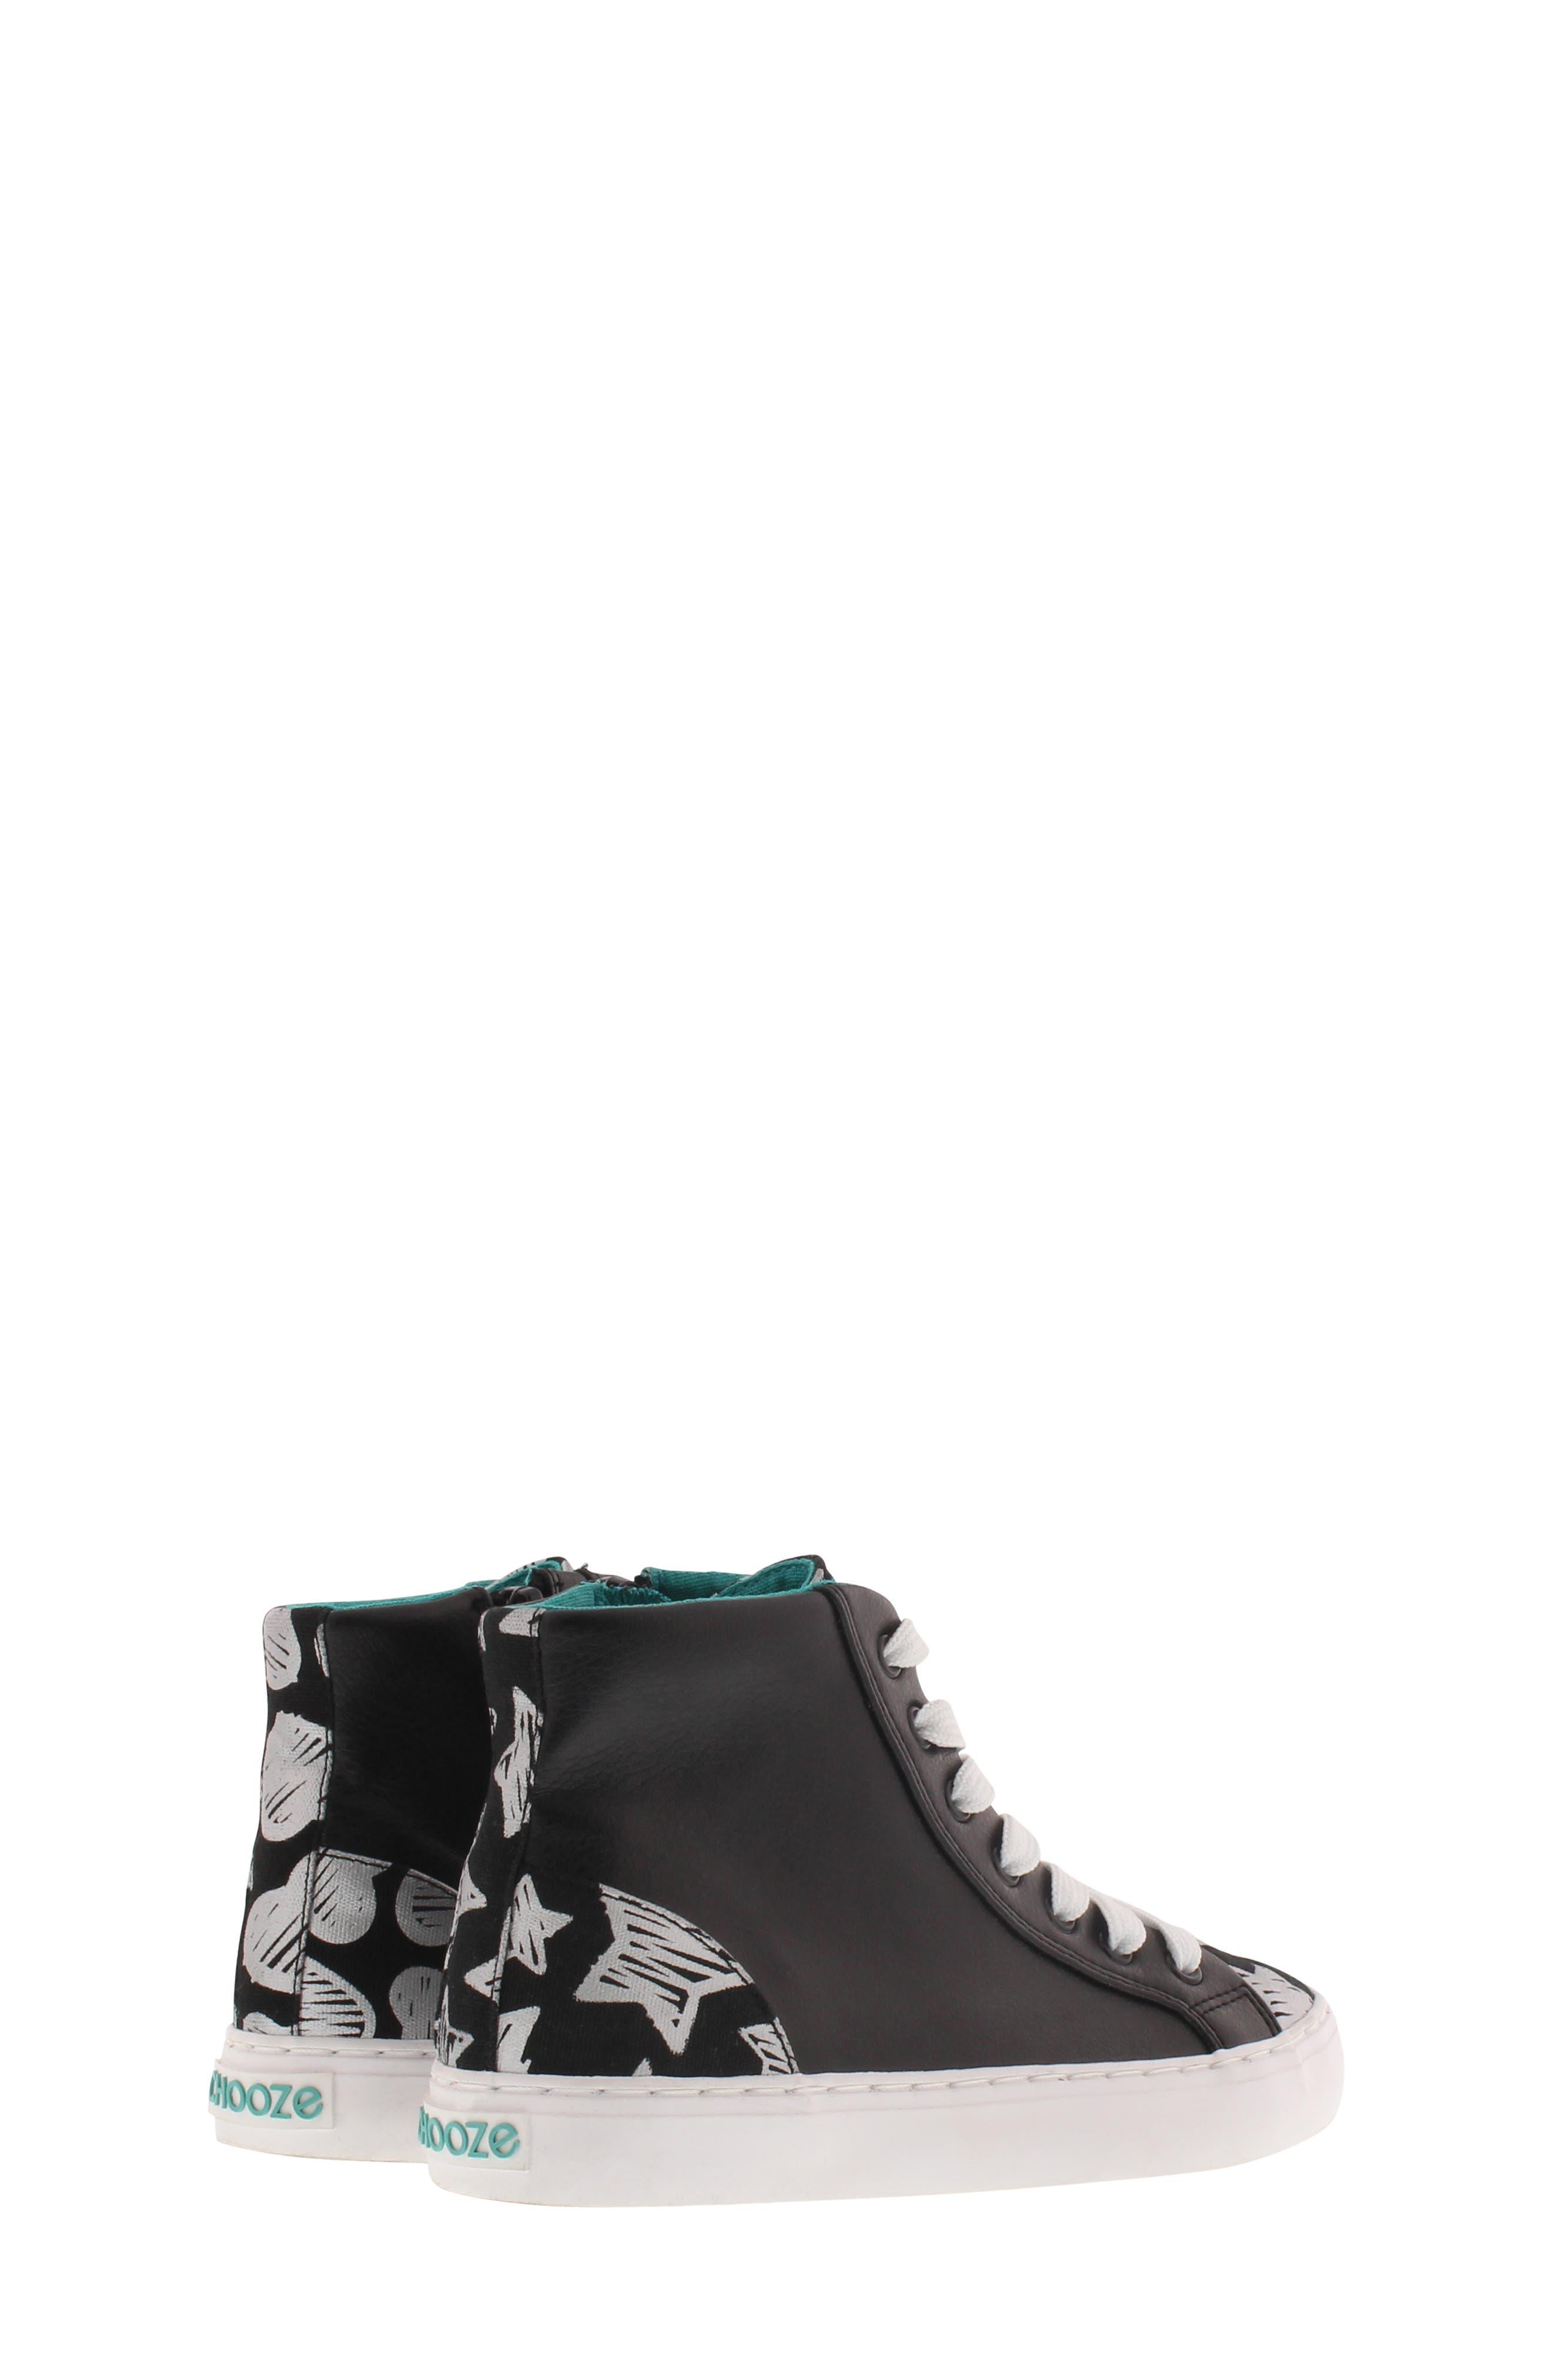 CHOOZE, Uplift Superstar High Top Sneaker, Alternate thumbnail 2, color, BLACK